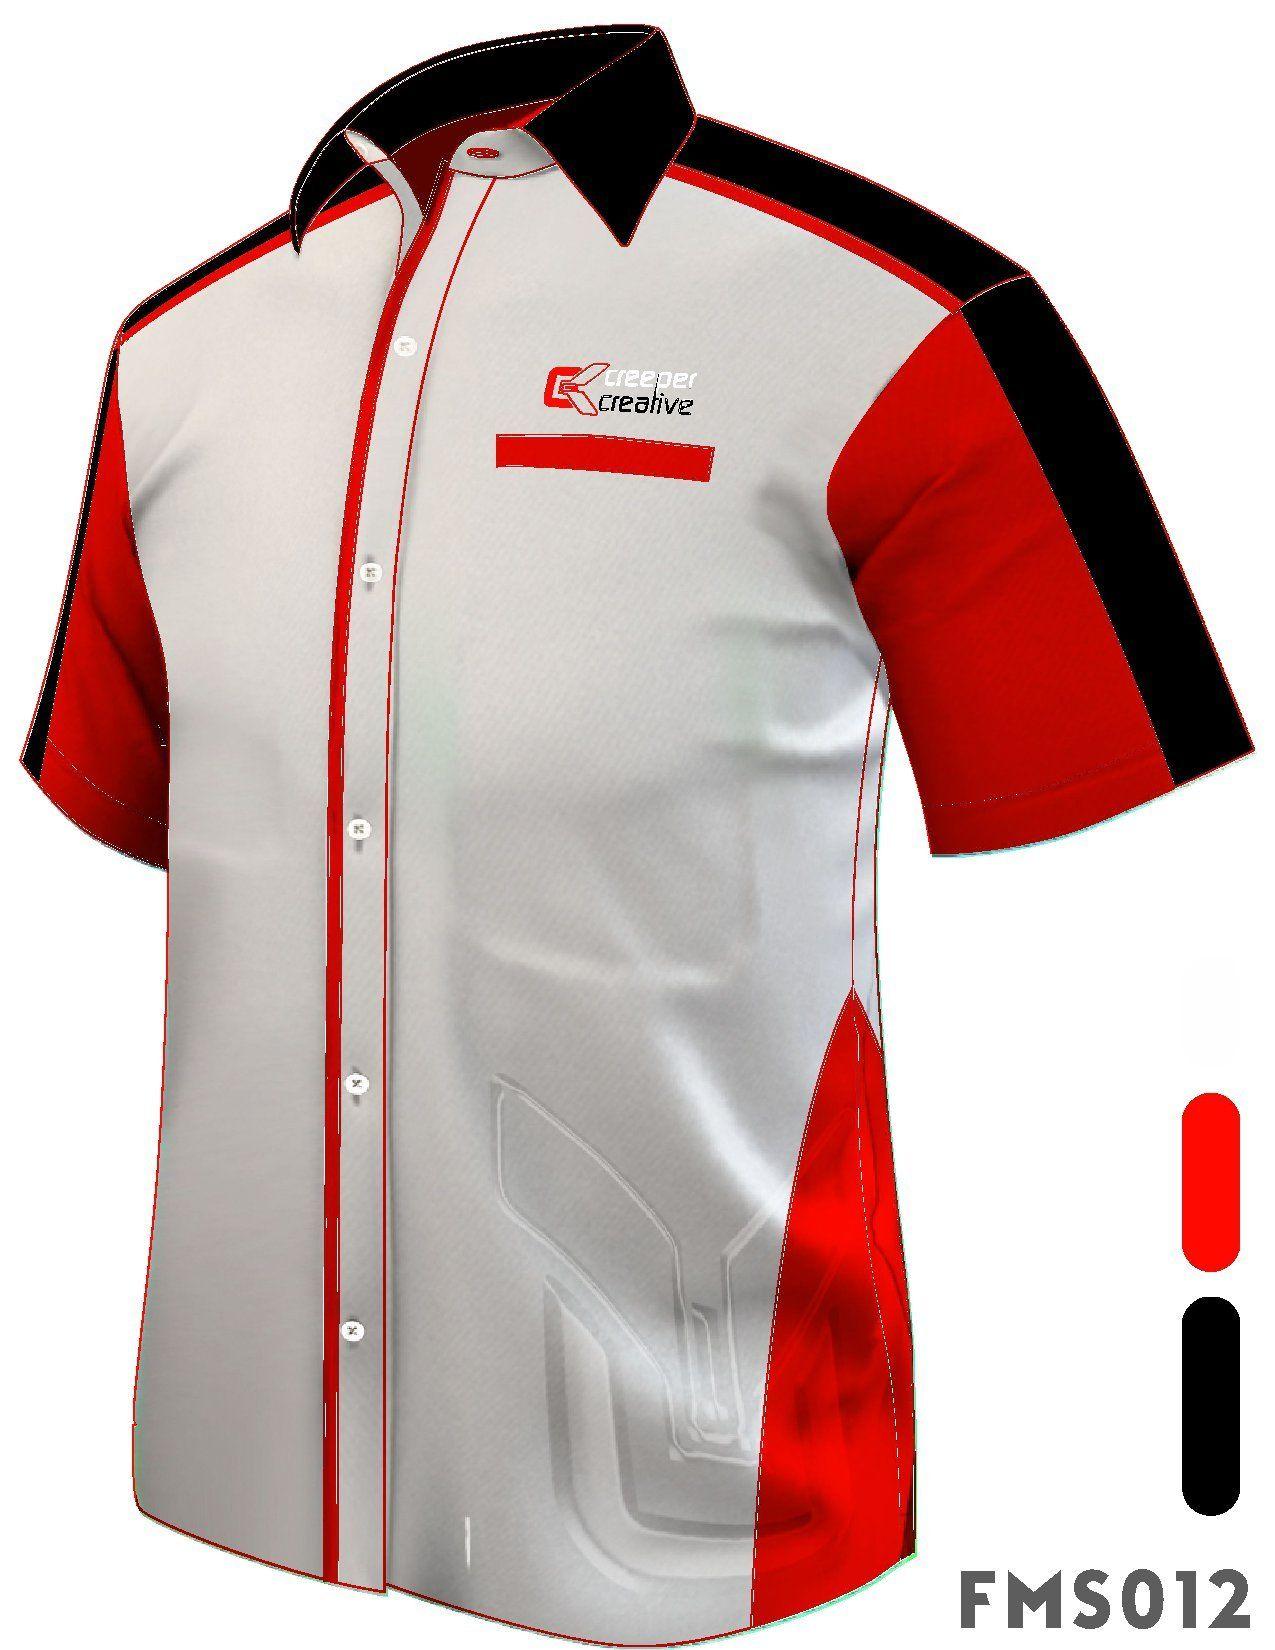 Baju Korporat Lelaki Baju Korporat Lelaki F1 Uniform Corporate